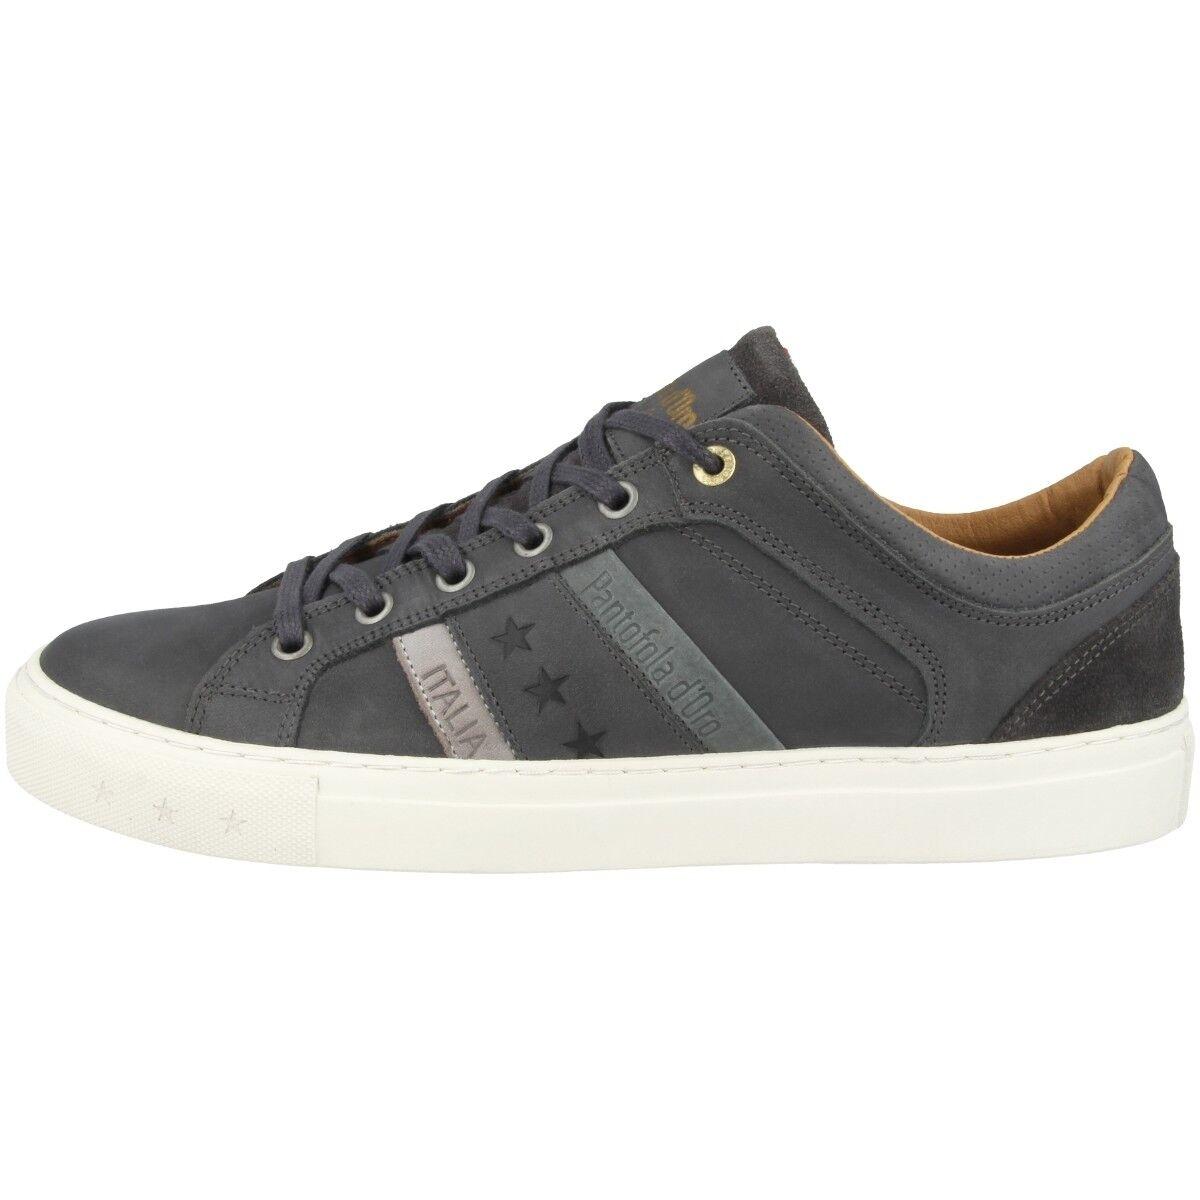 Pantofola d Oro Monza  Herren Niedrig Cut Schuhe Schuhe Schuhe Herren Sneaker shadow 10173028.7ZW 1dc56e